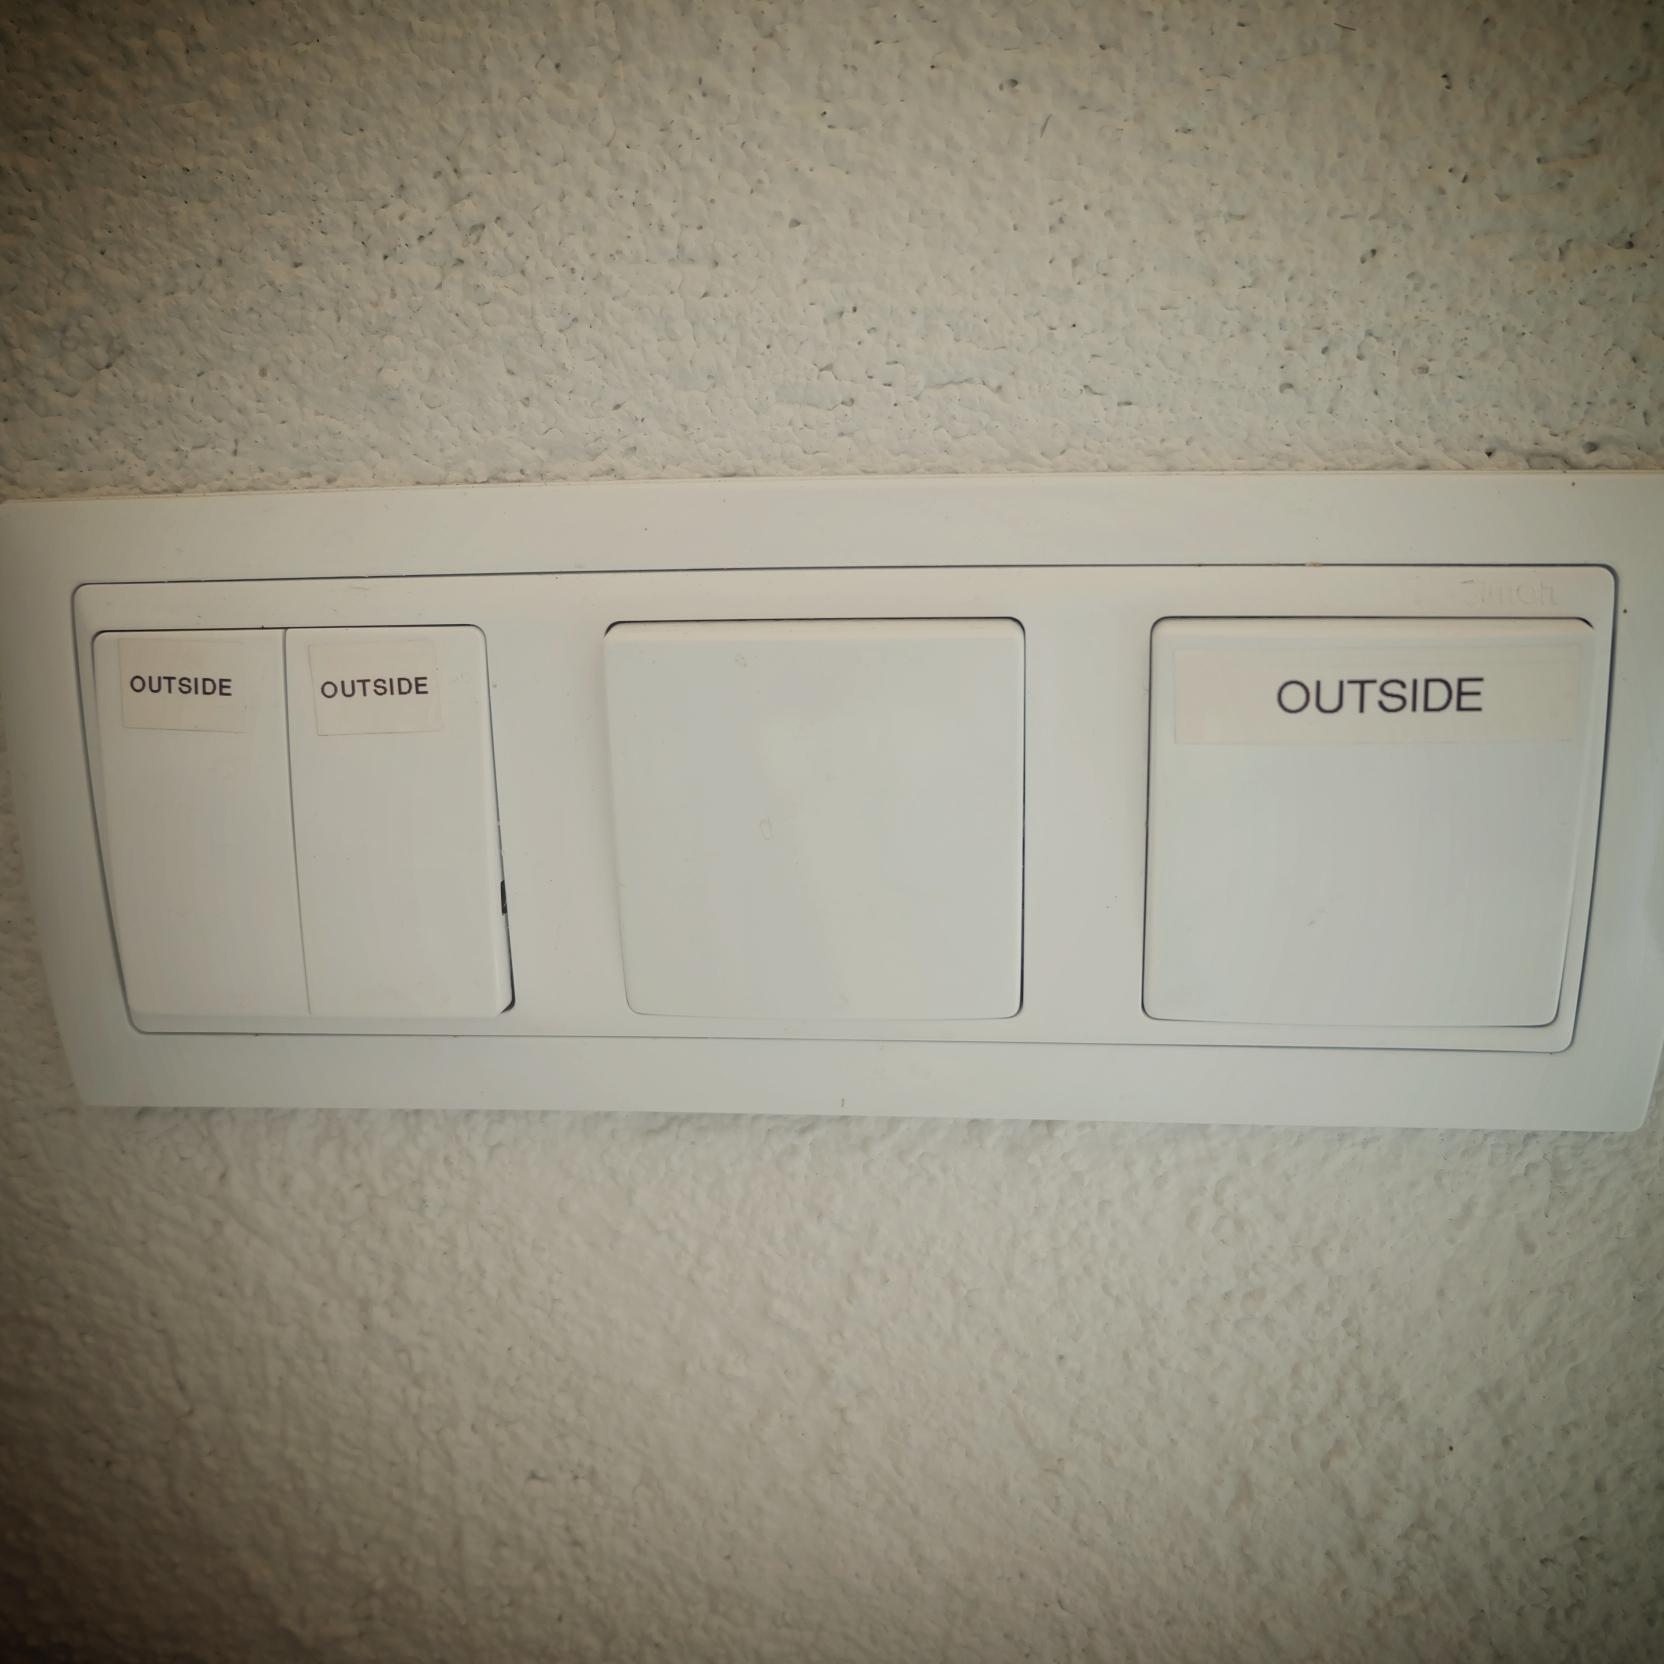 Light switch ergonomics 5